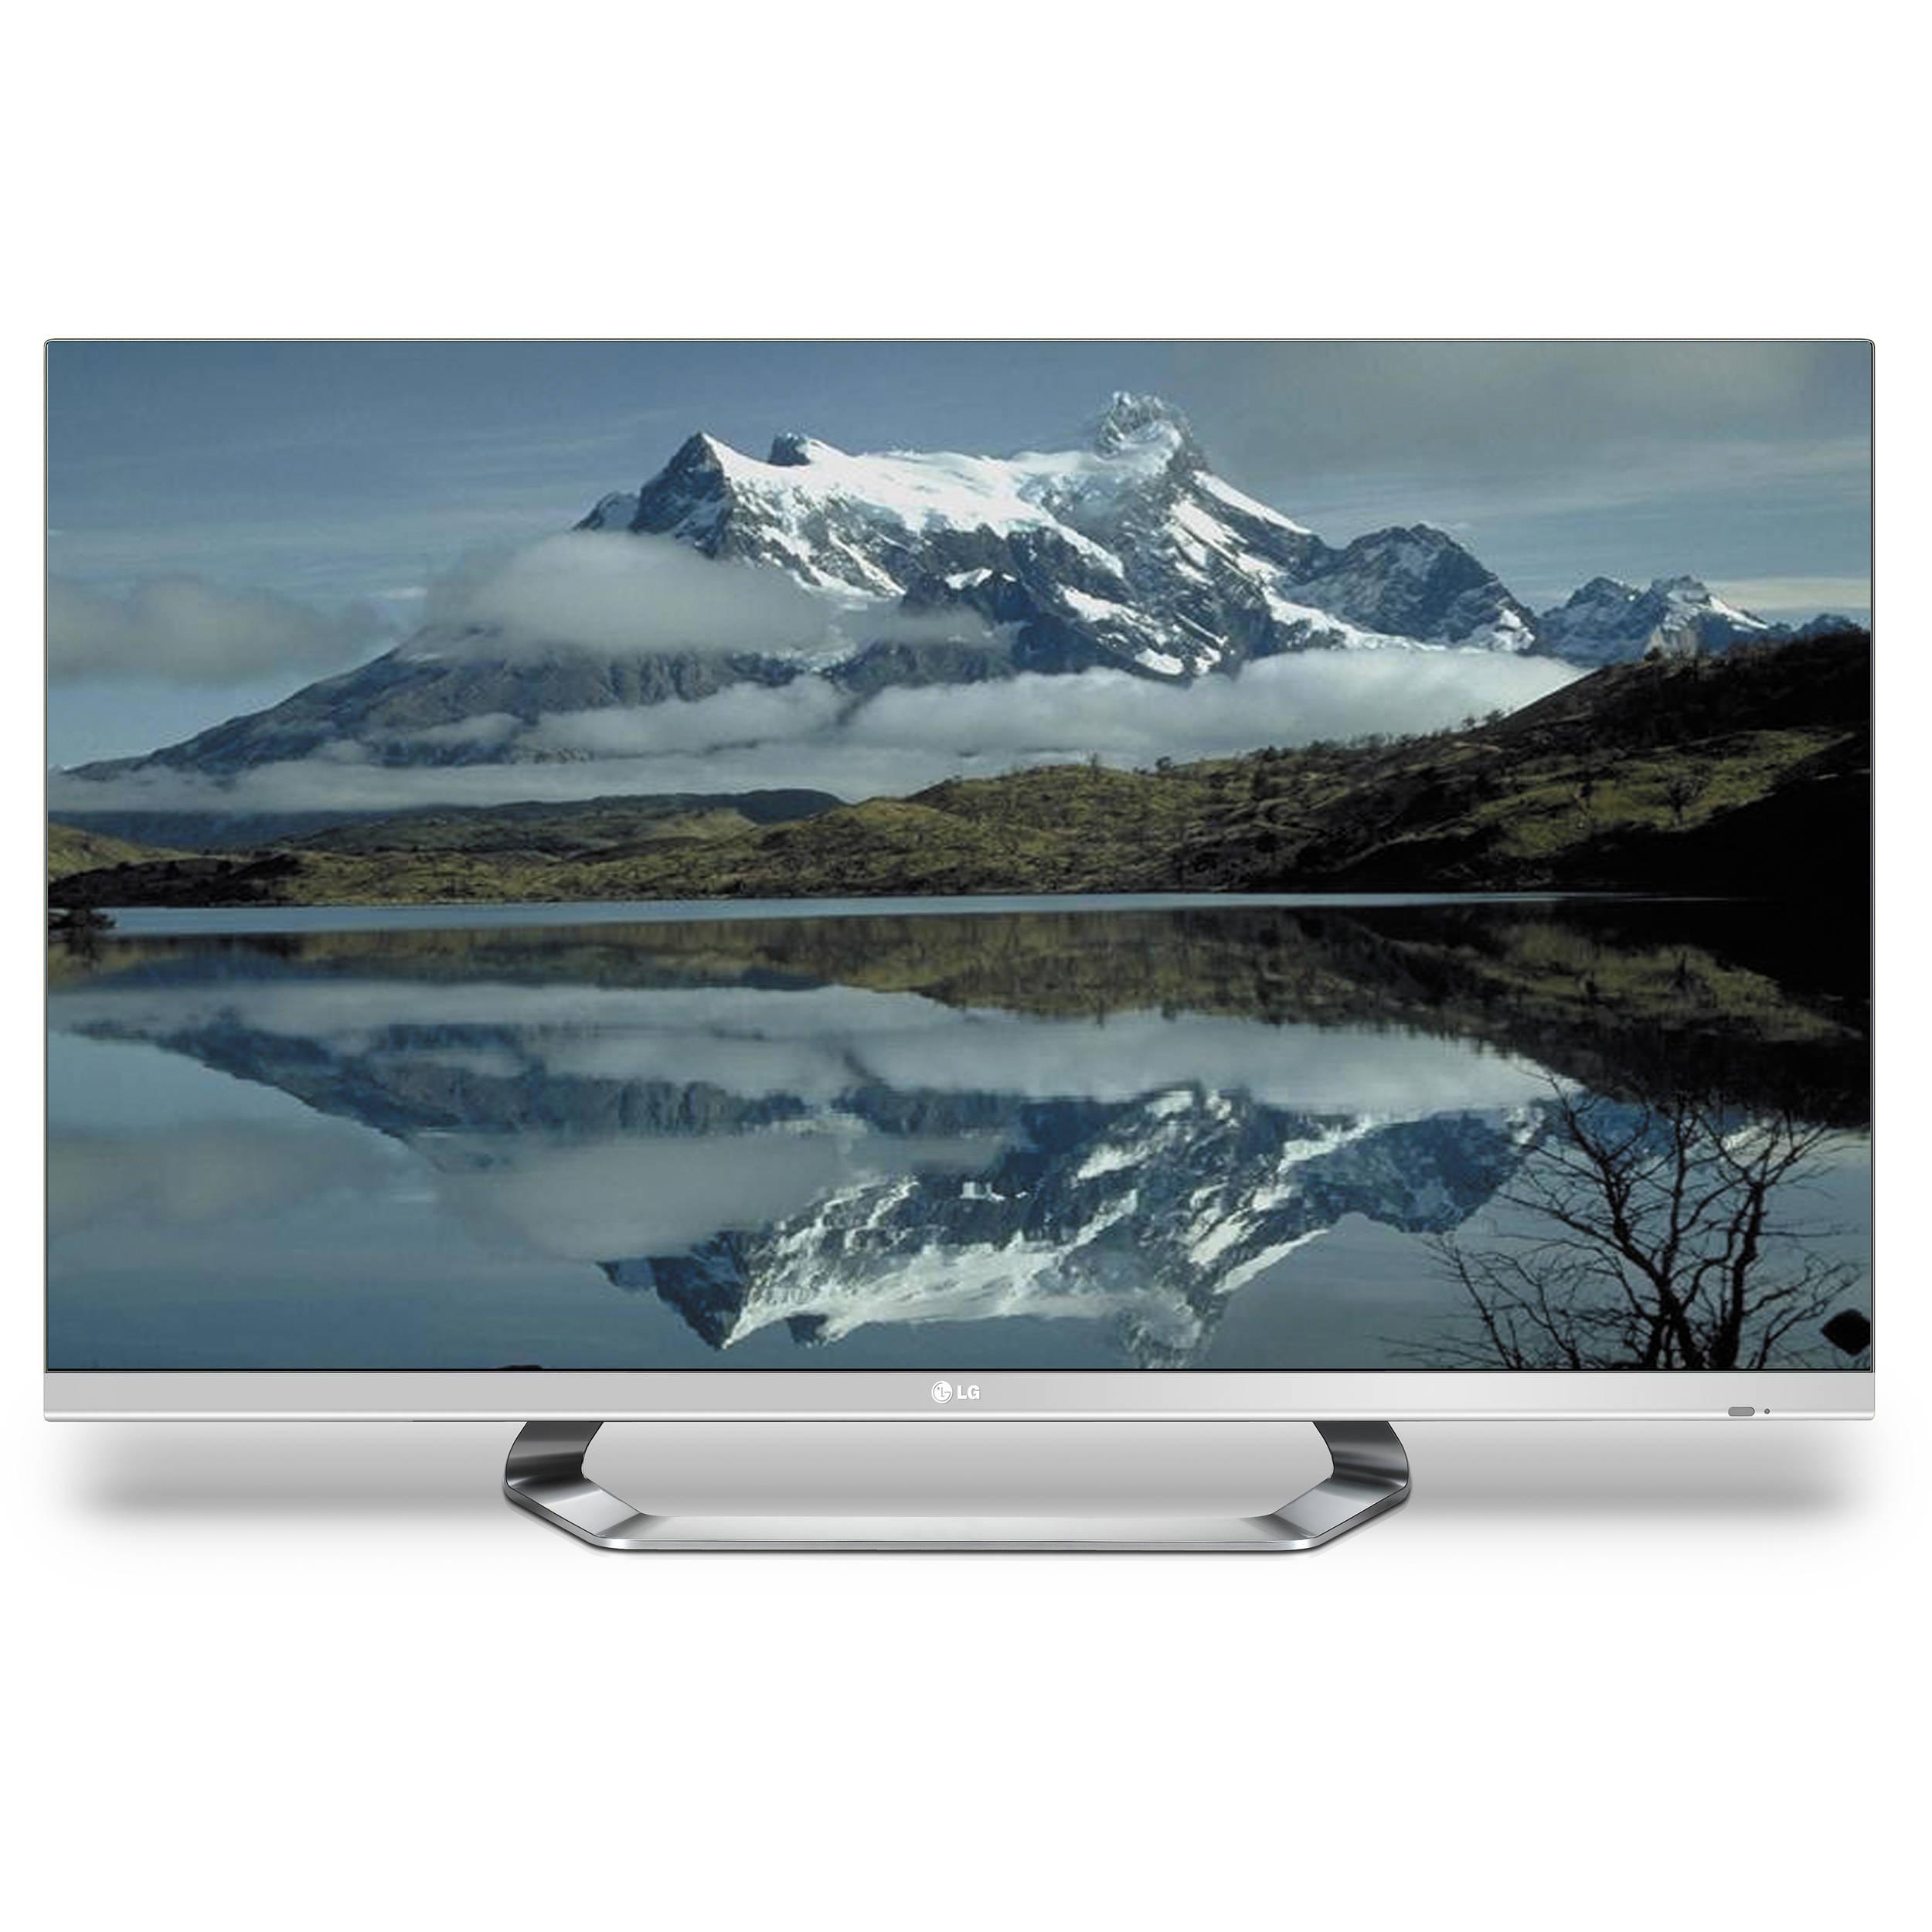 LG 55LM6700 TV Drivers Windows 7